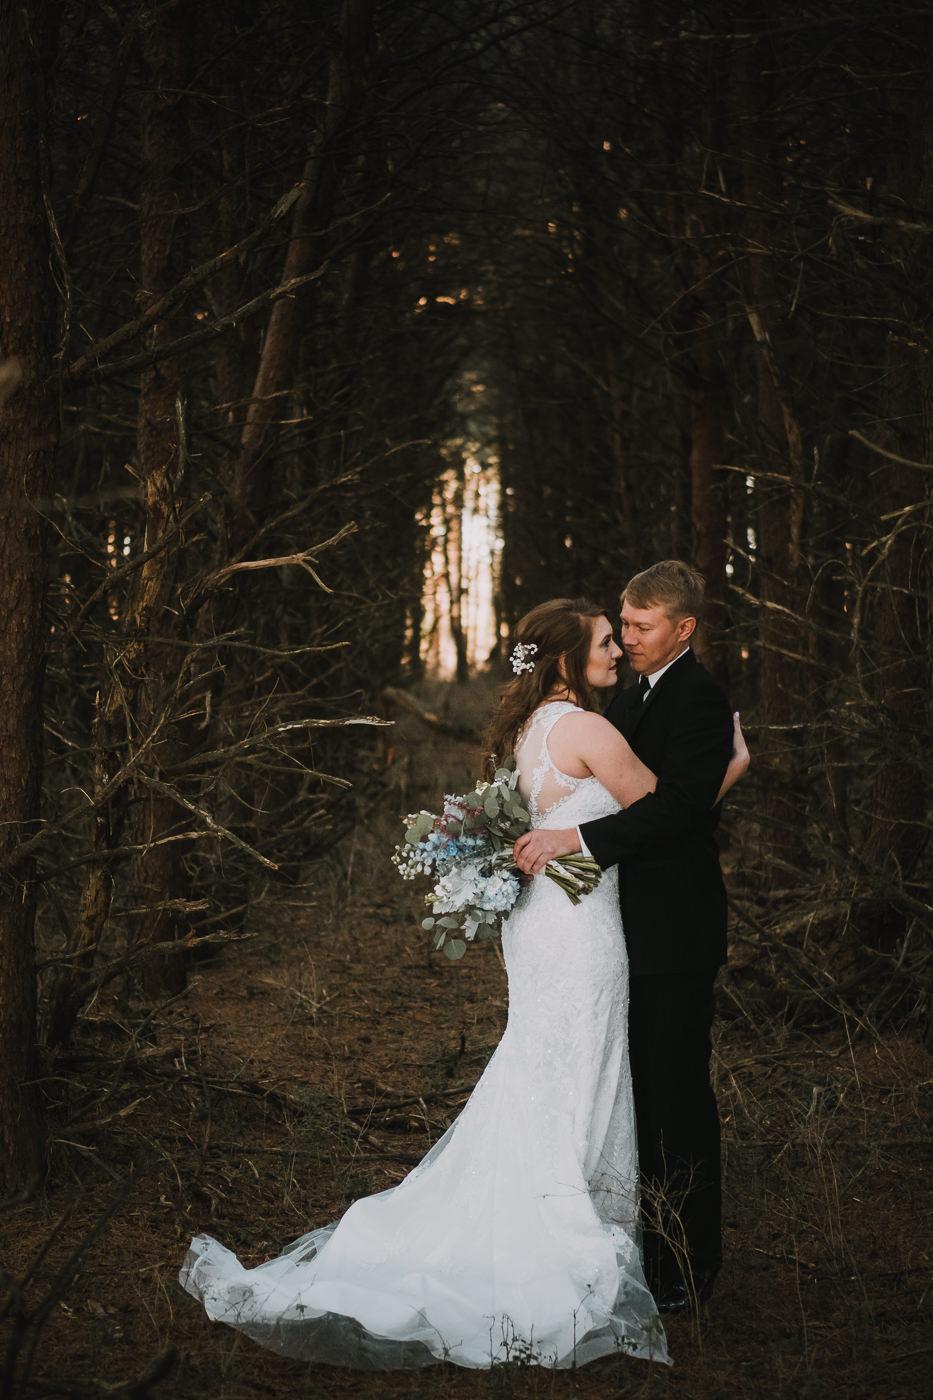 rogers.arkansas.weddingphotos.©2018mileswittboyer-21.jpg